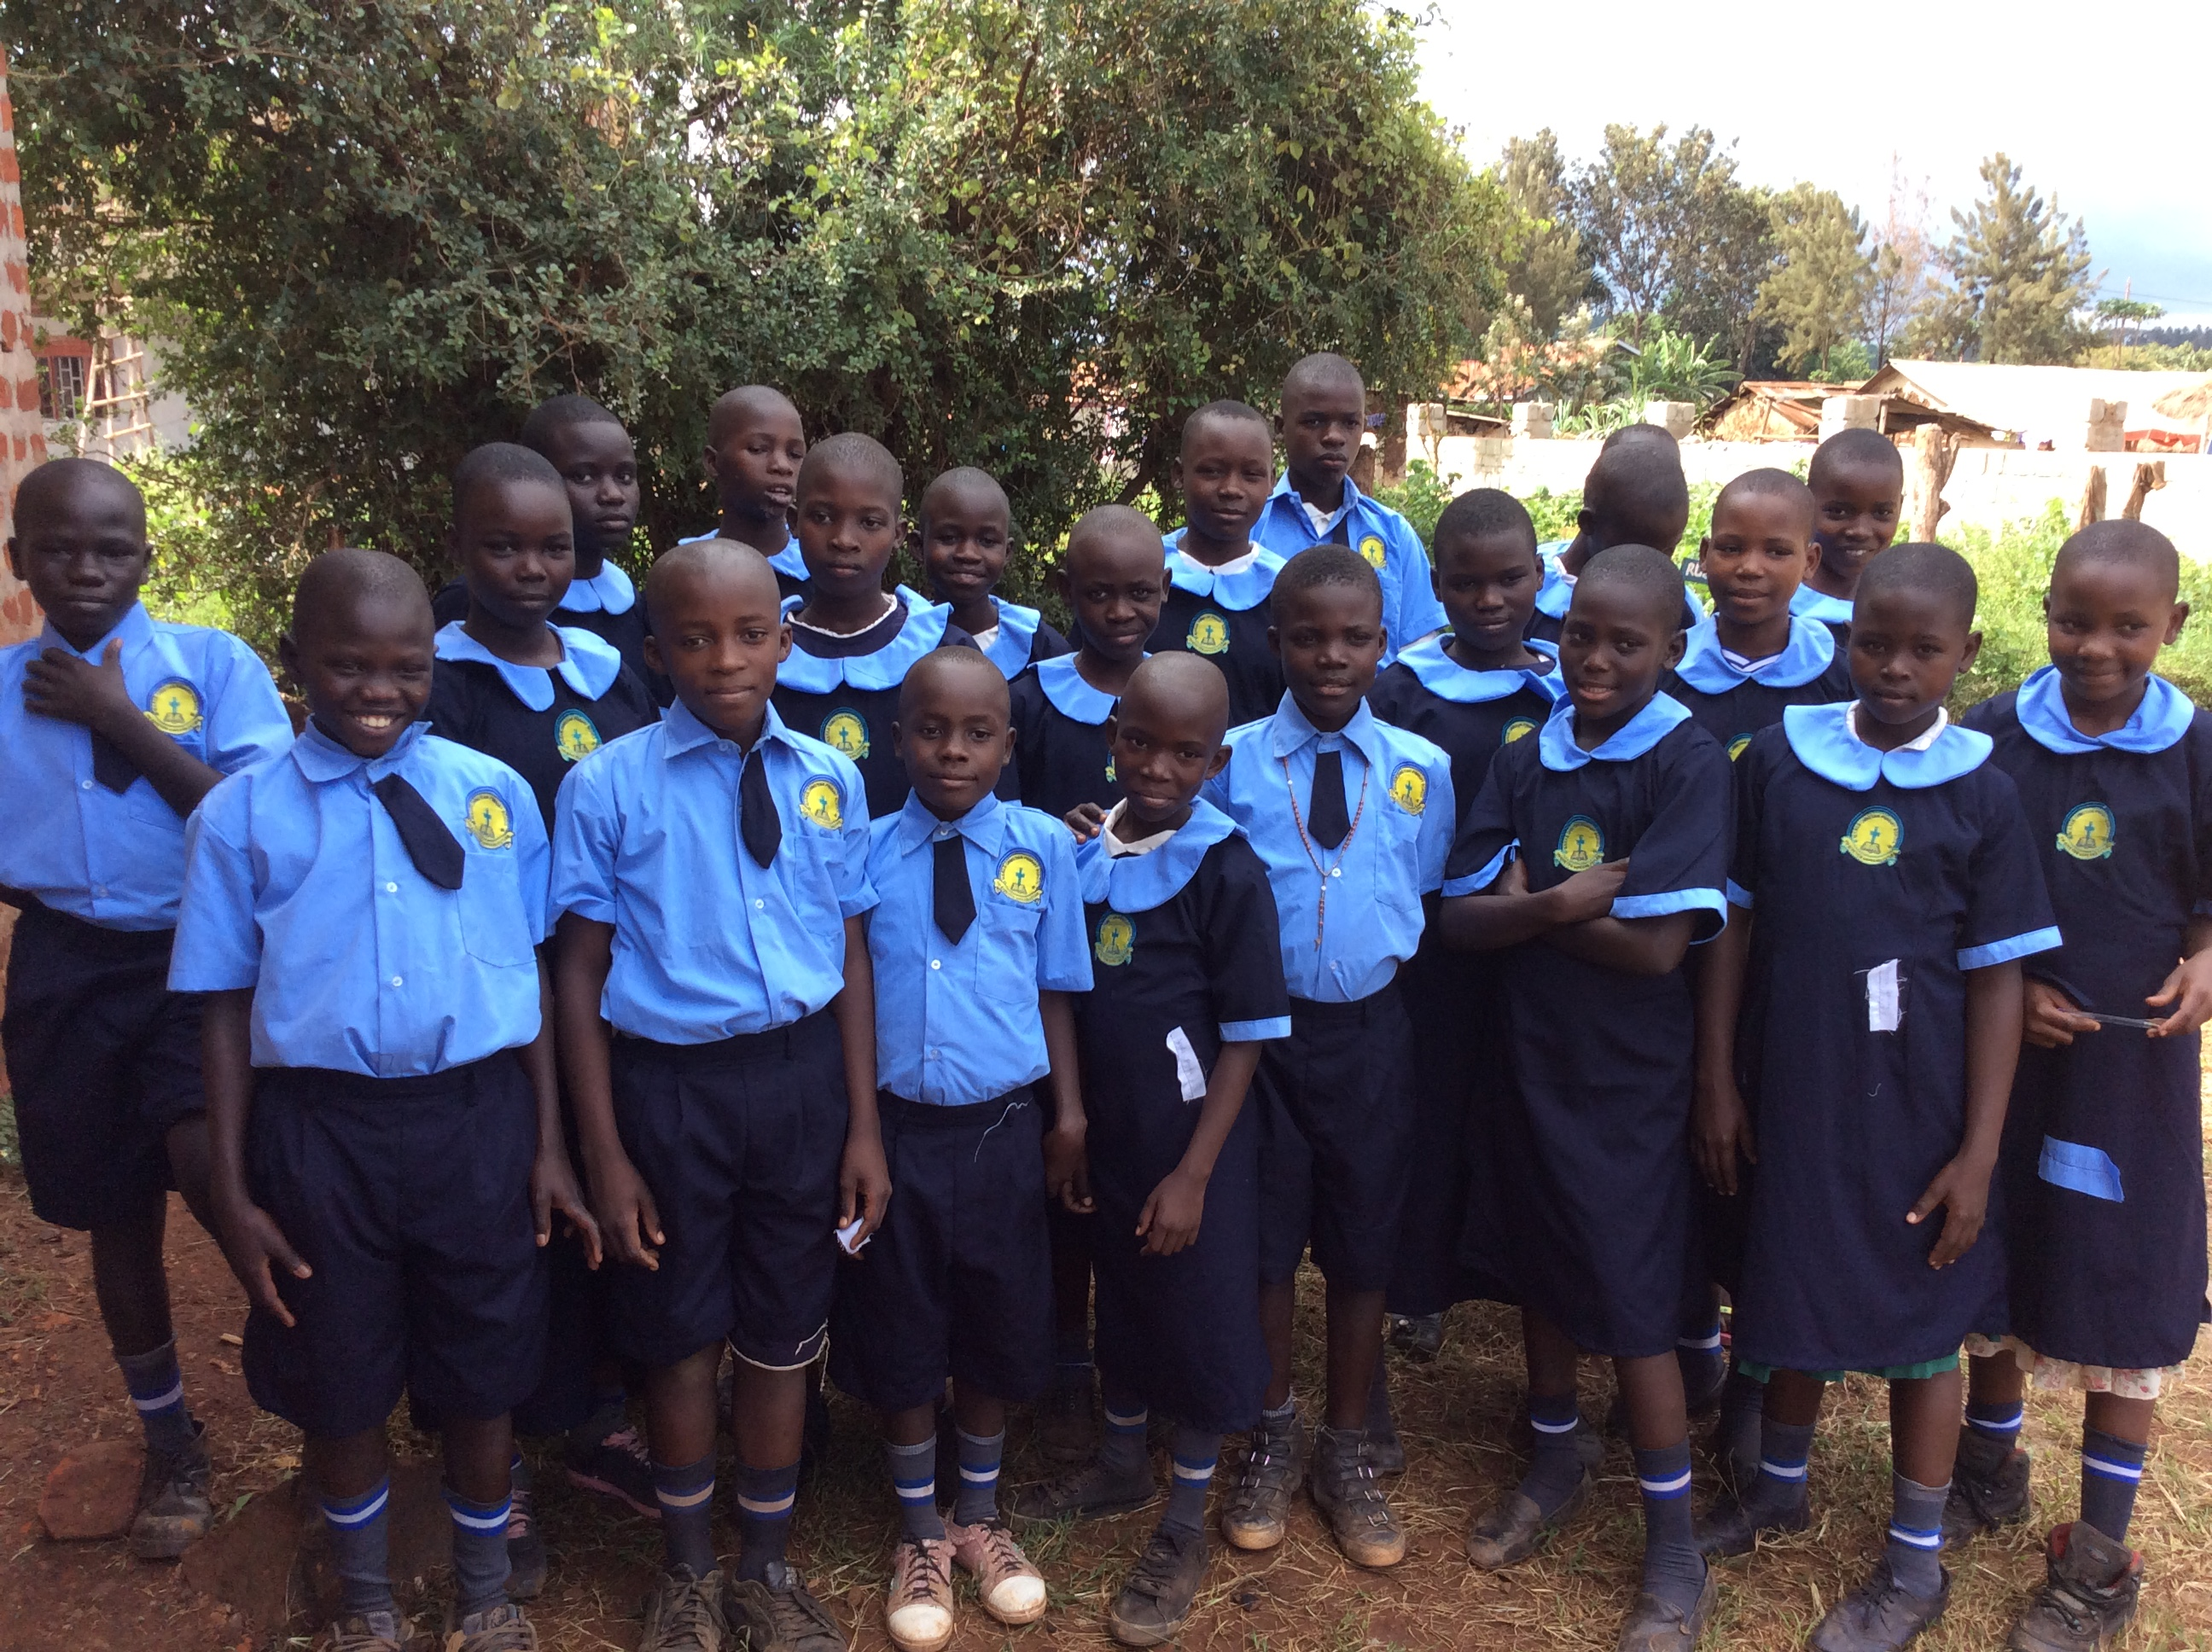 boys-and-girls-from-free-school-in-slums-Uganda